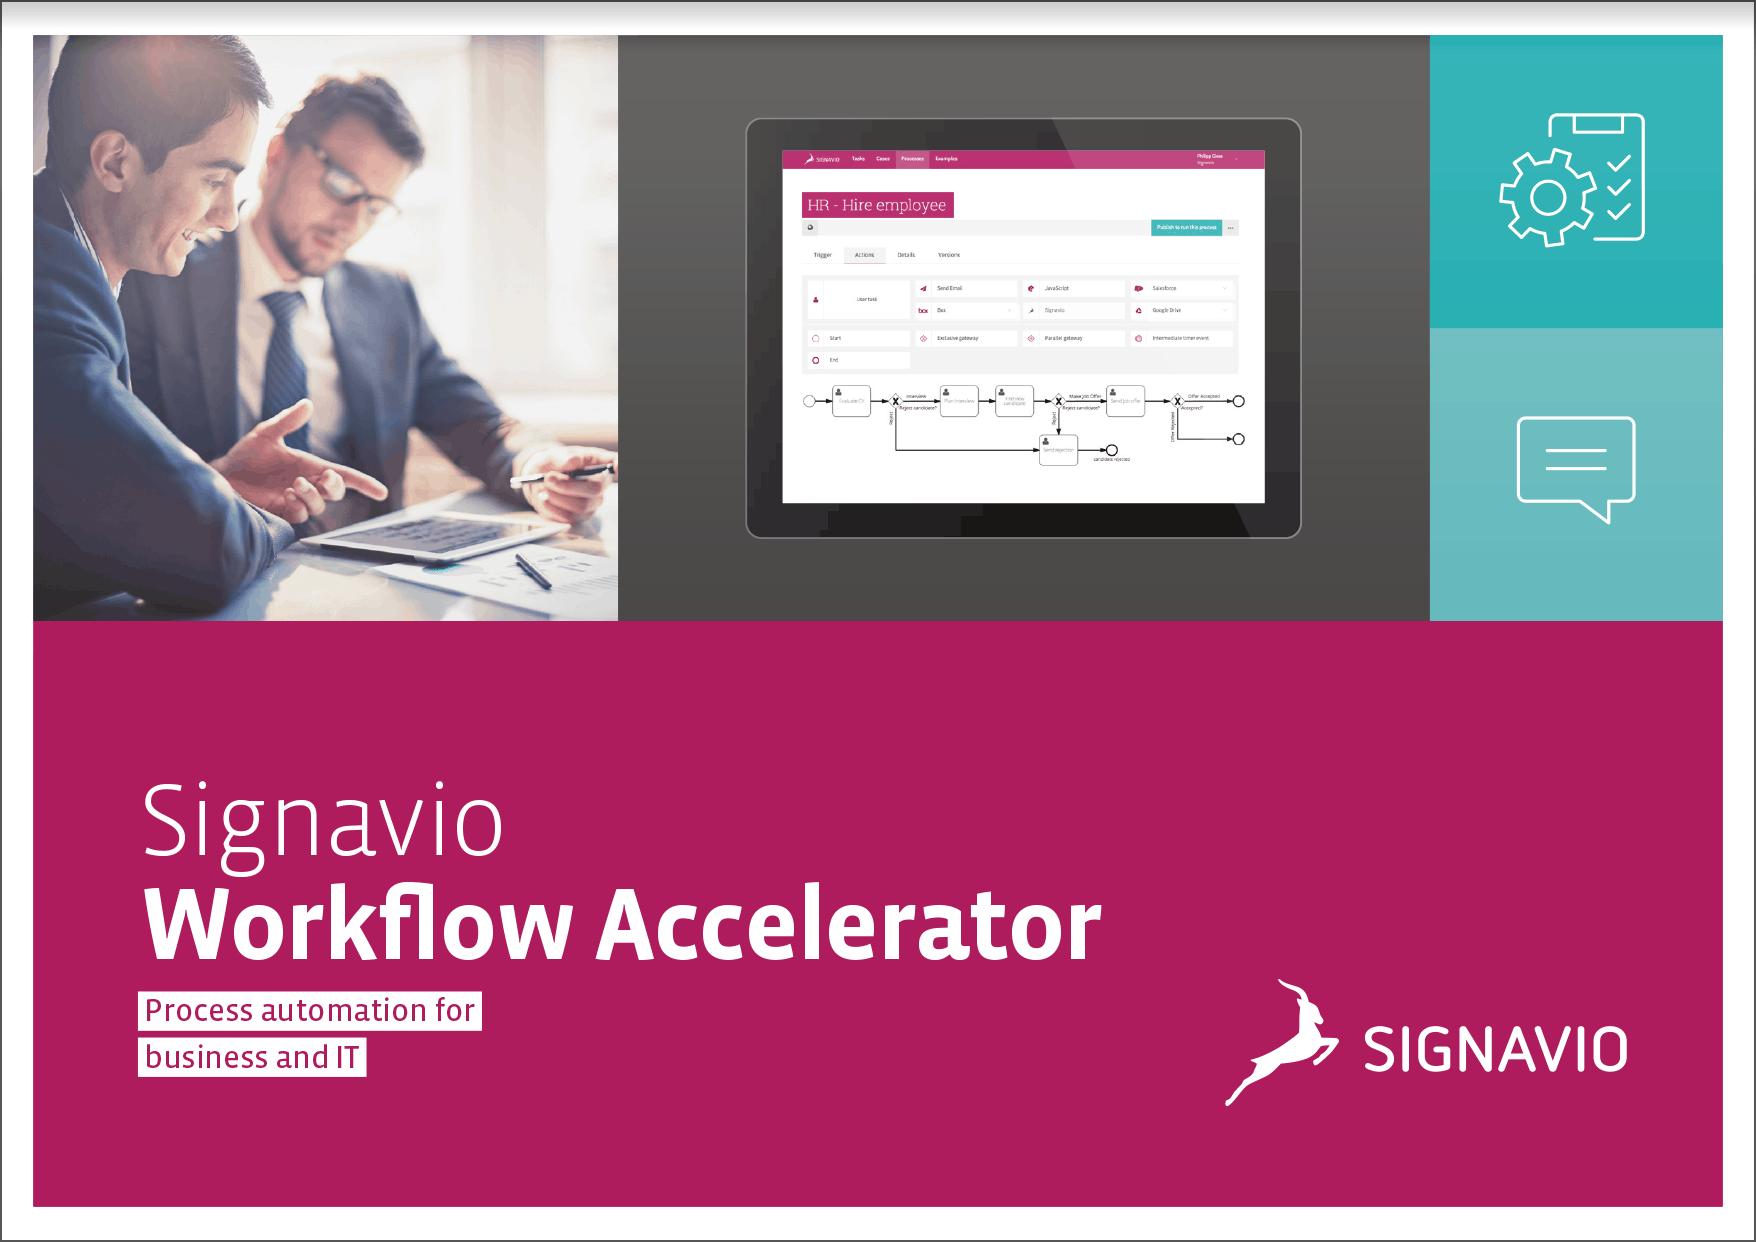 Signavio Workflow Accelerator Brochure